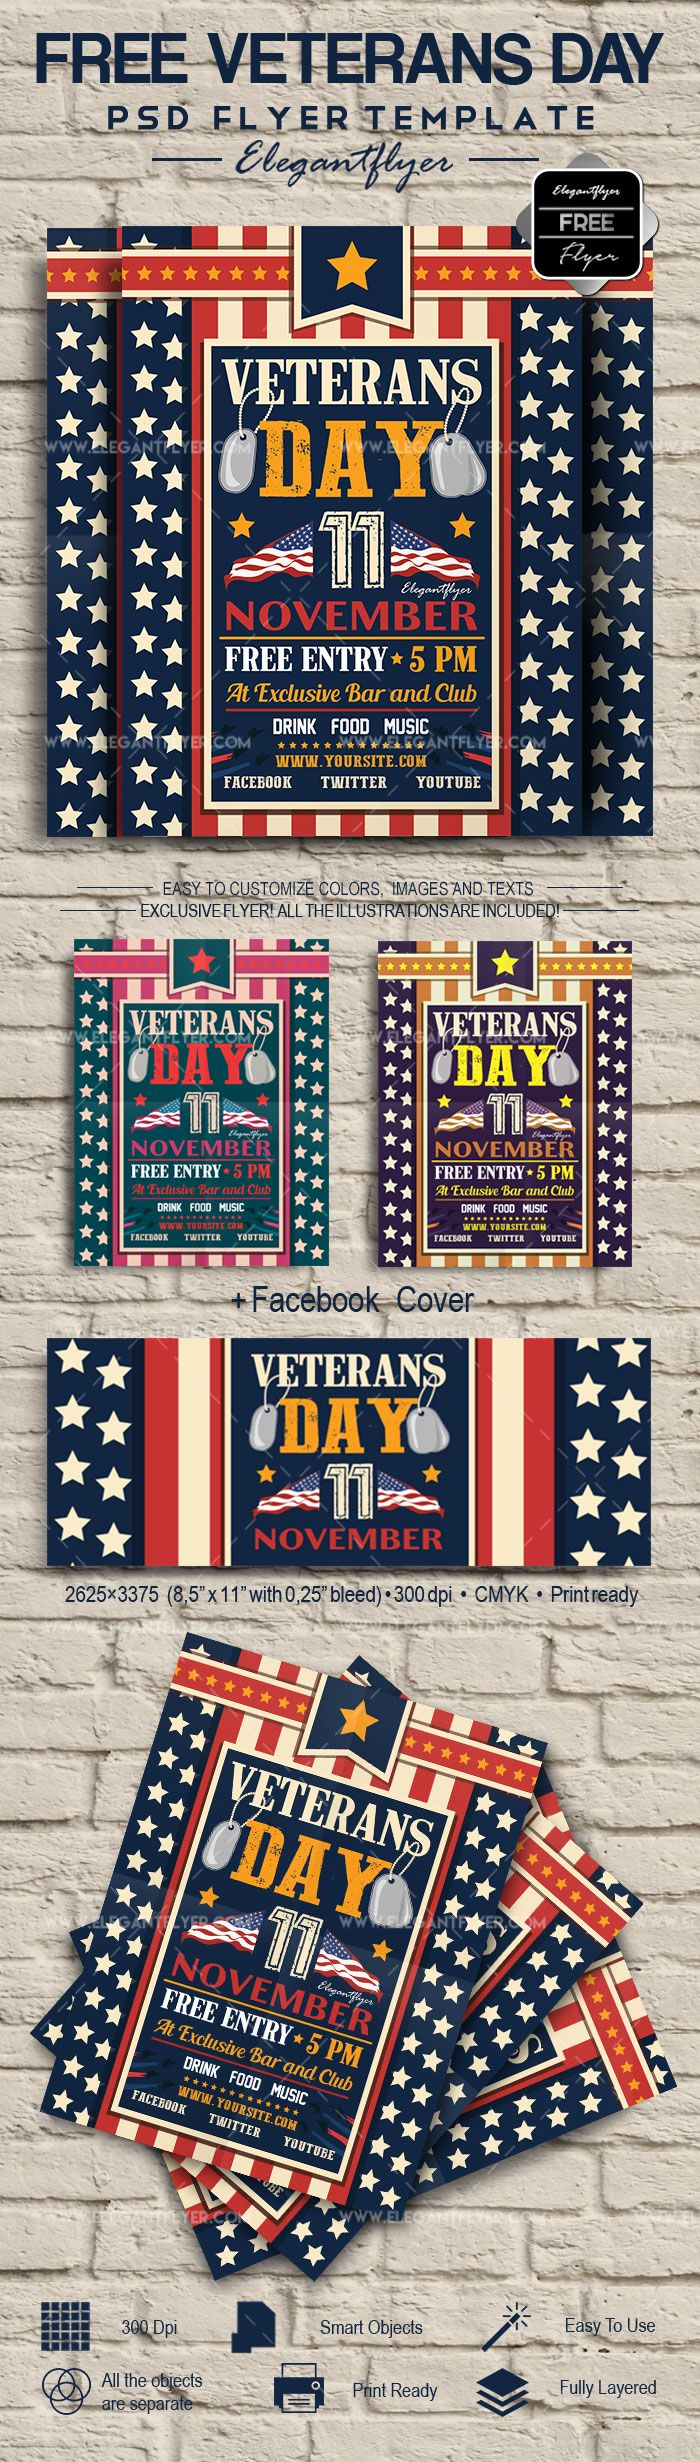 https://www.elegantflyer.com/free-flyers/veterans-day-free-flyer-psd-template-facebook-cover/